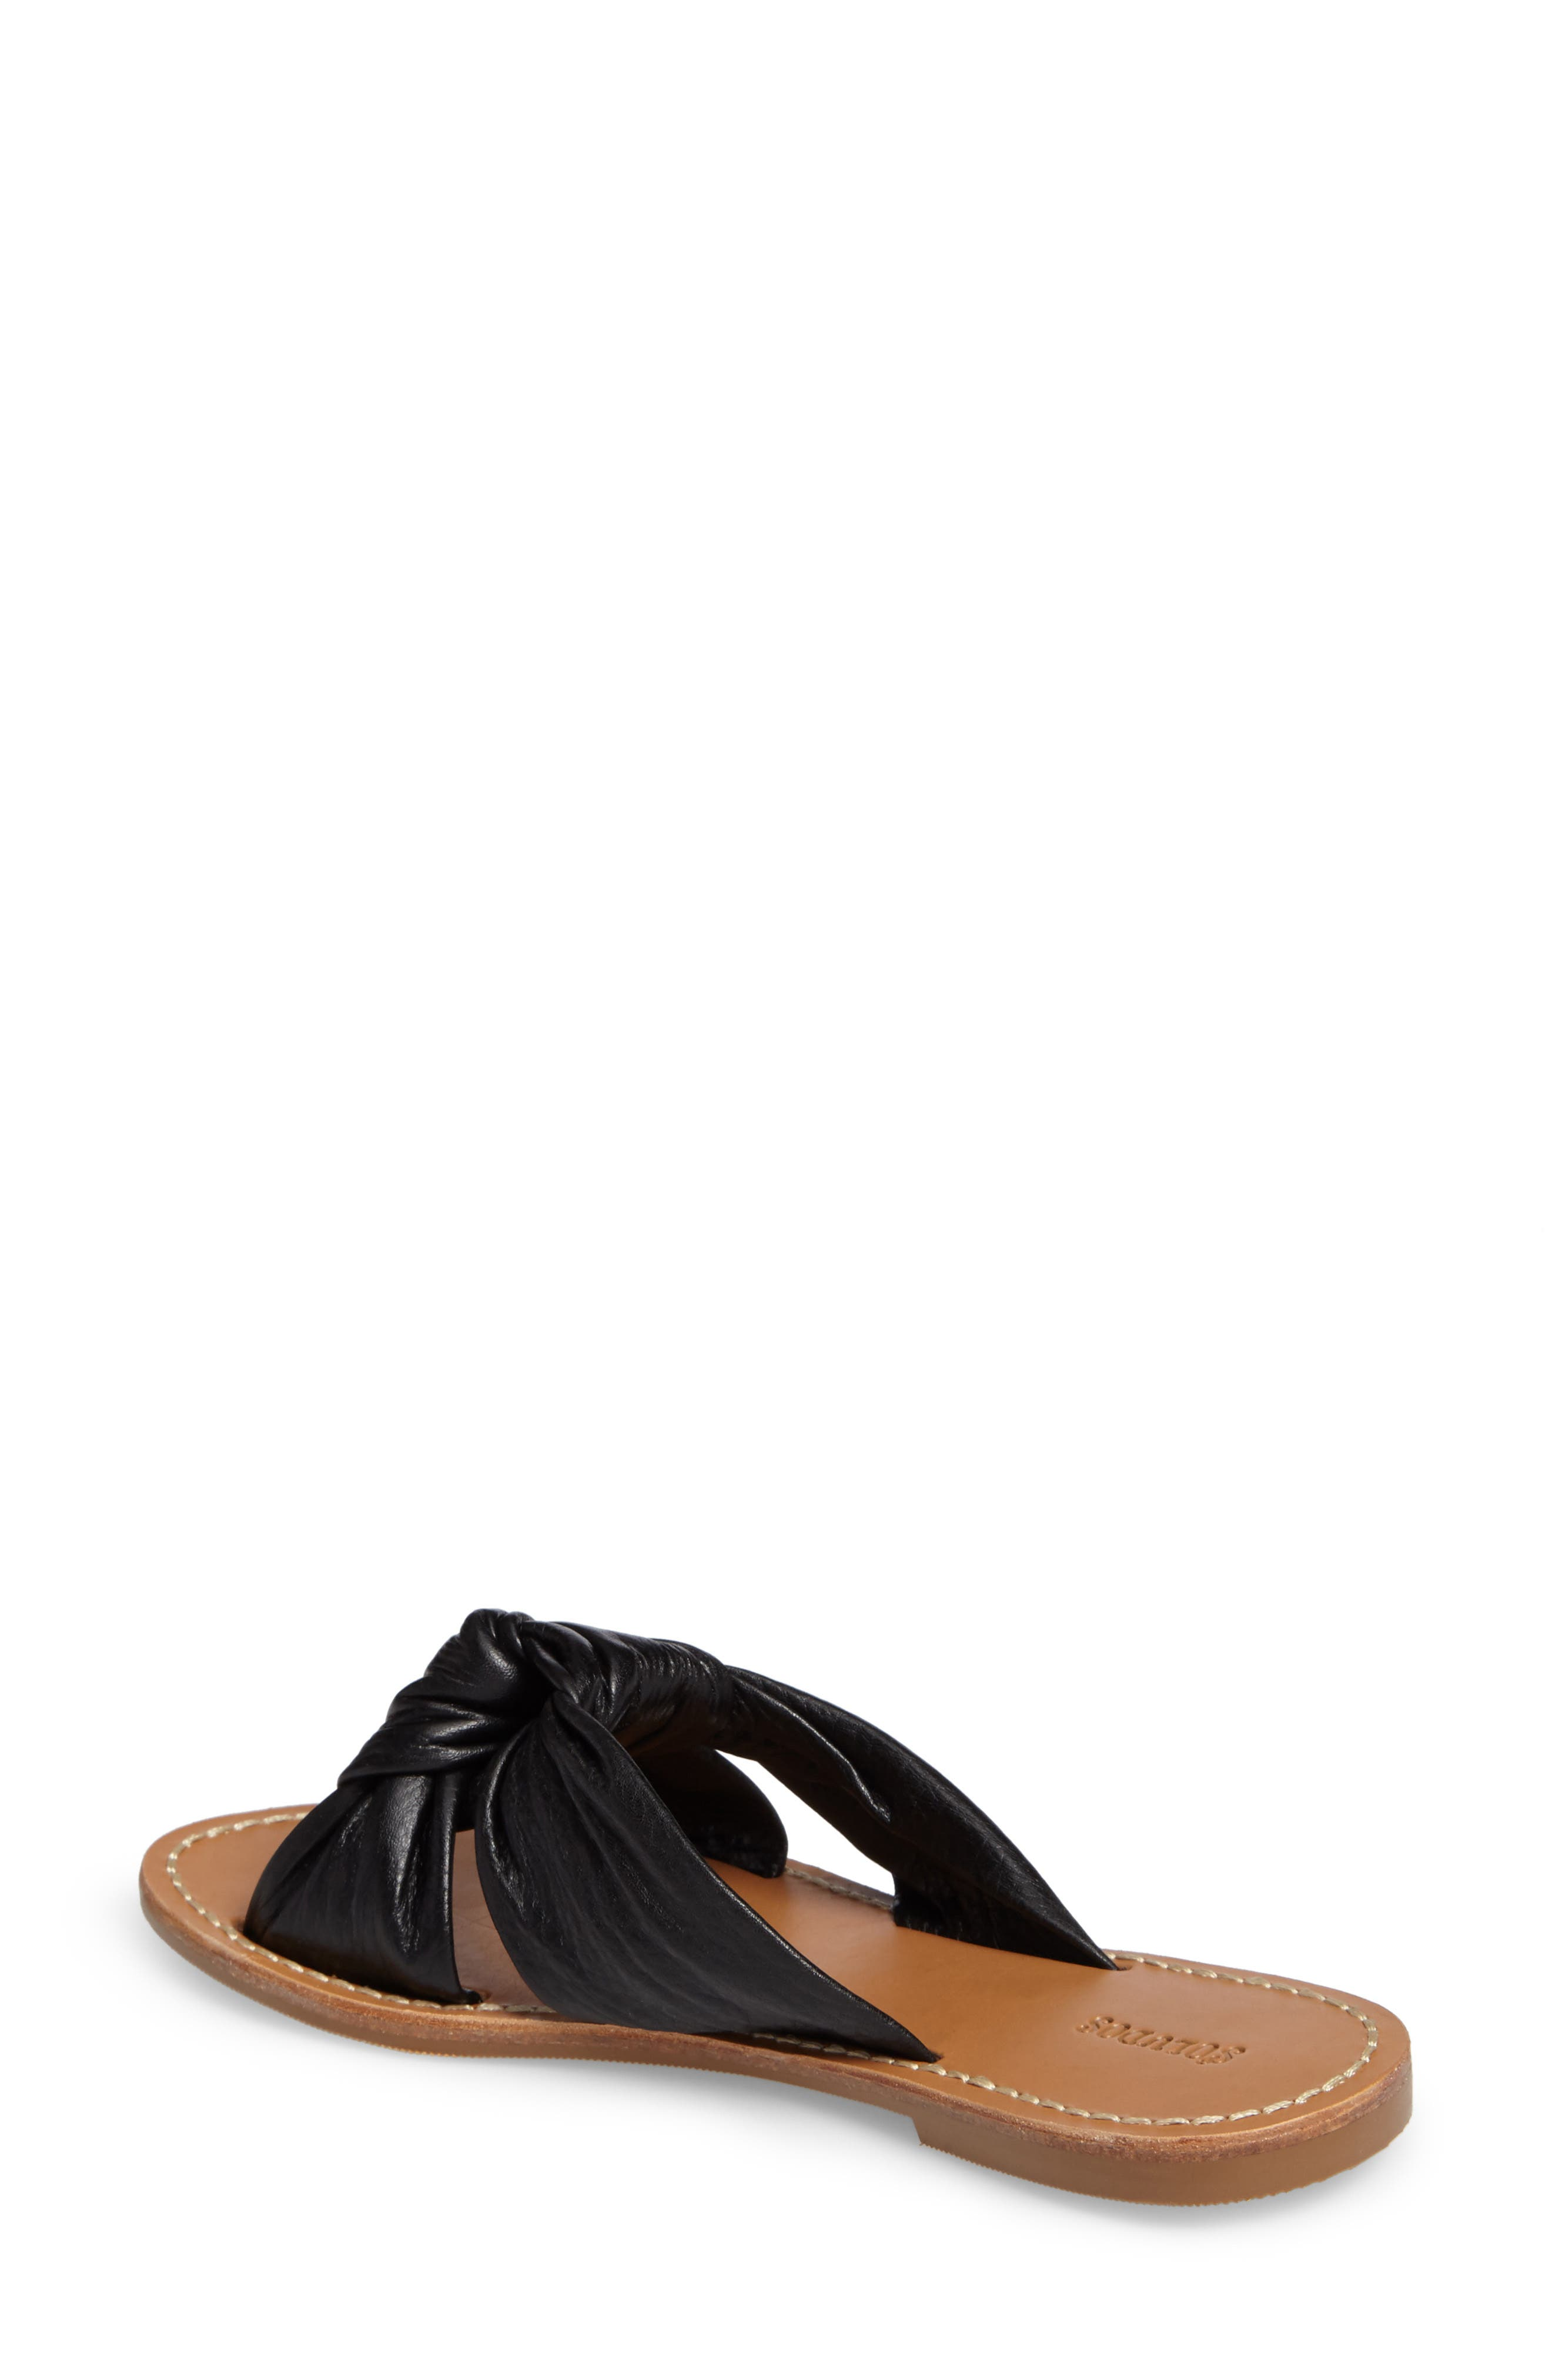 Alternate Image 2  - Soludos Knotted Slide Sandal (Women)